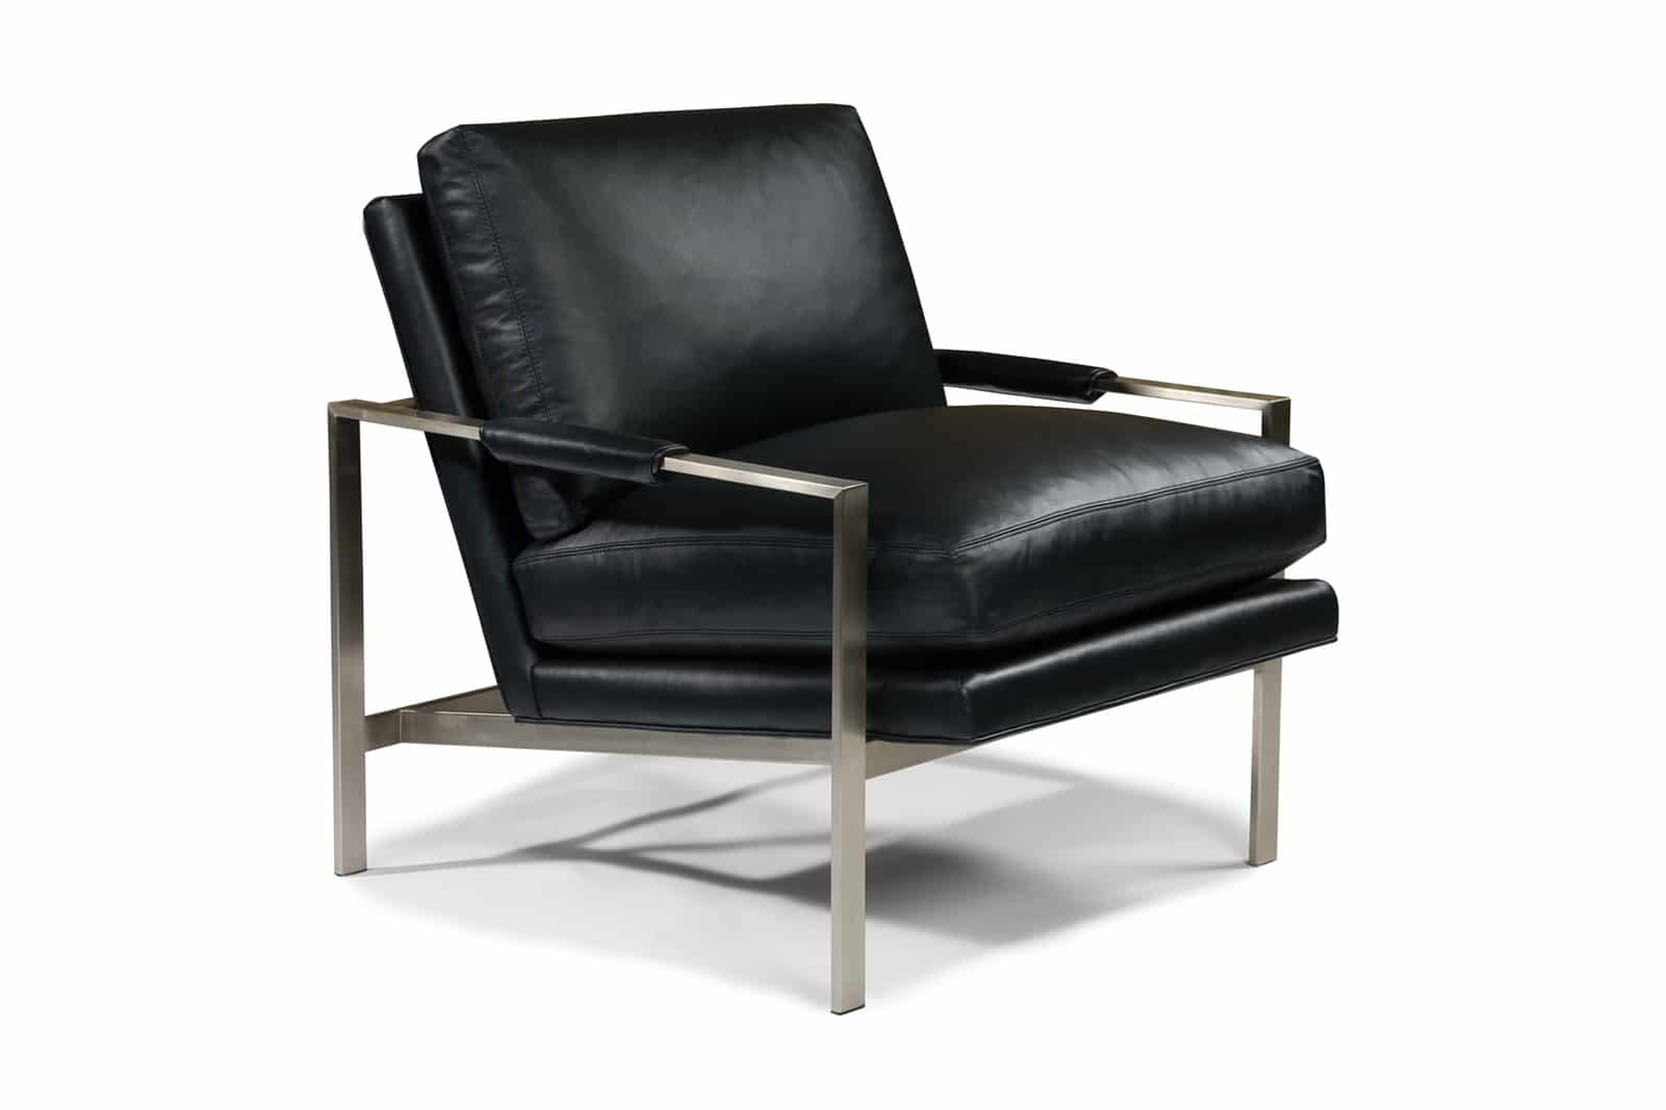 951 design classic chair